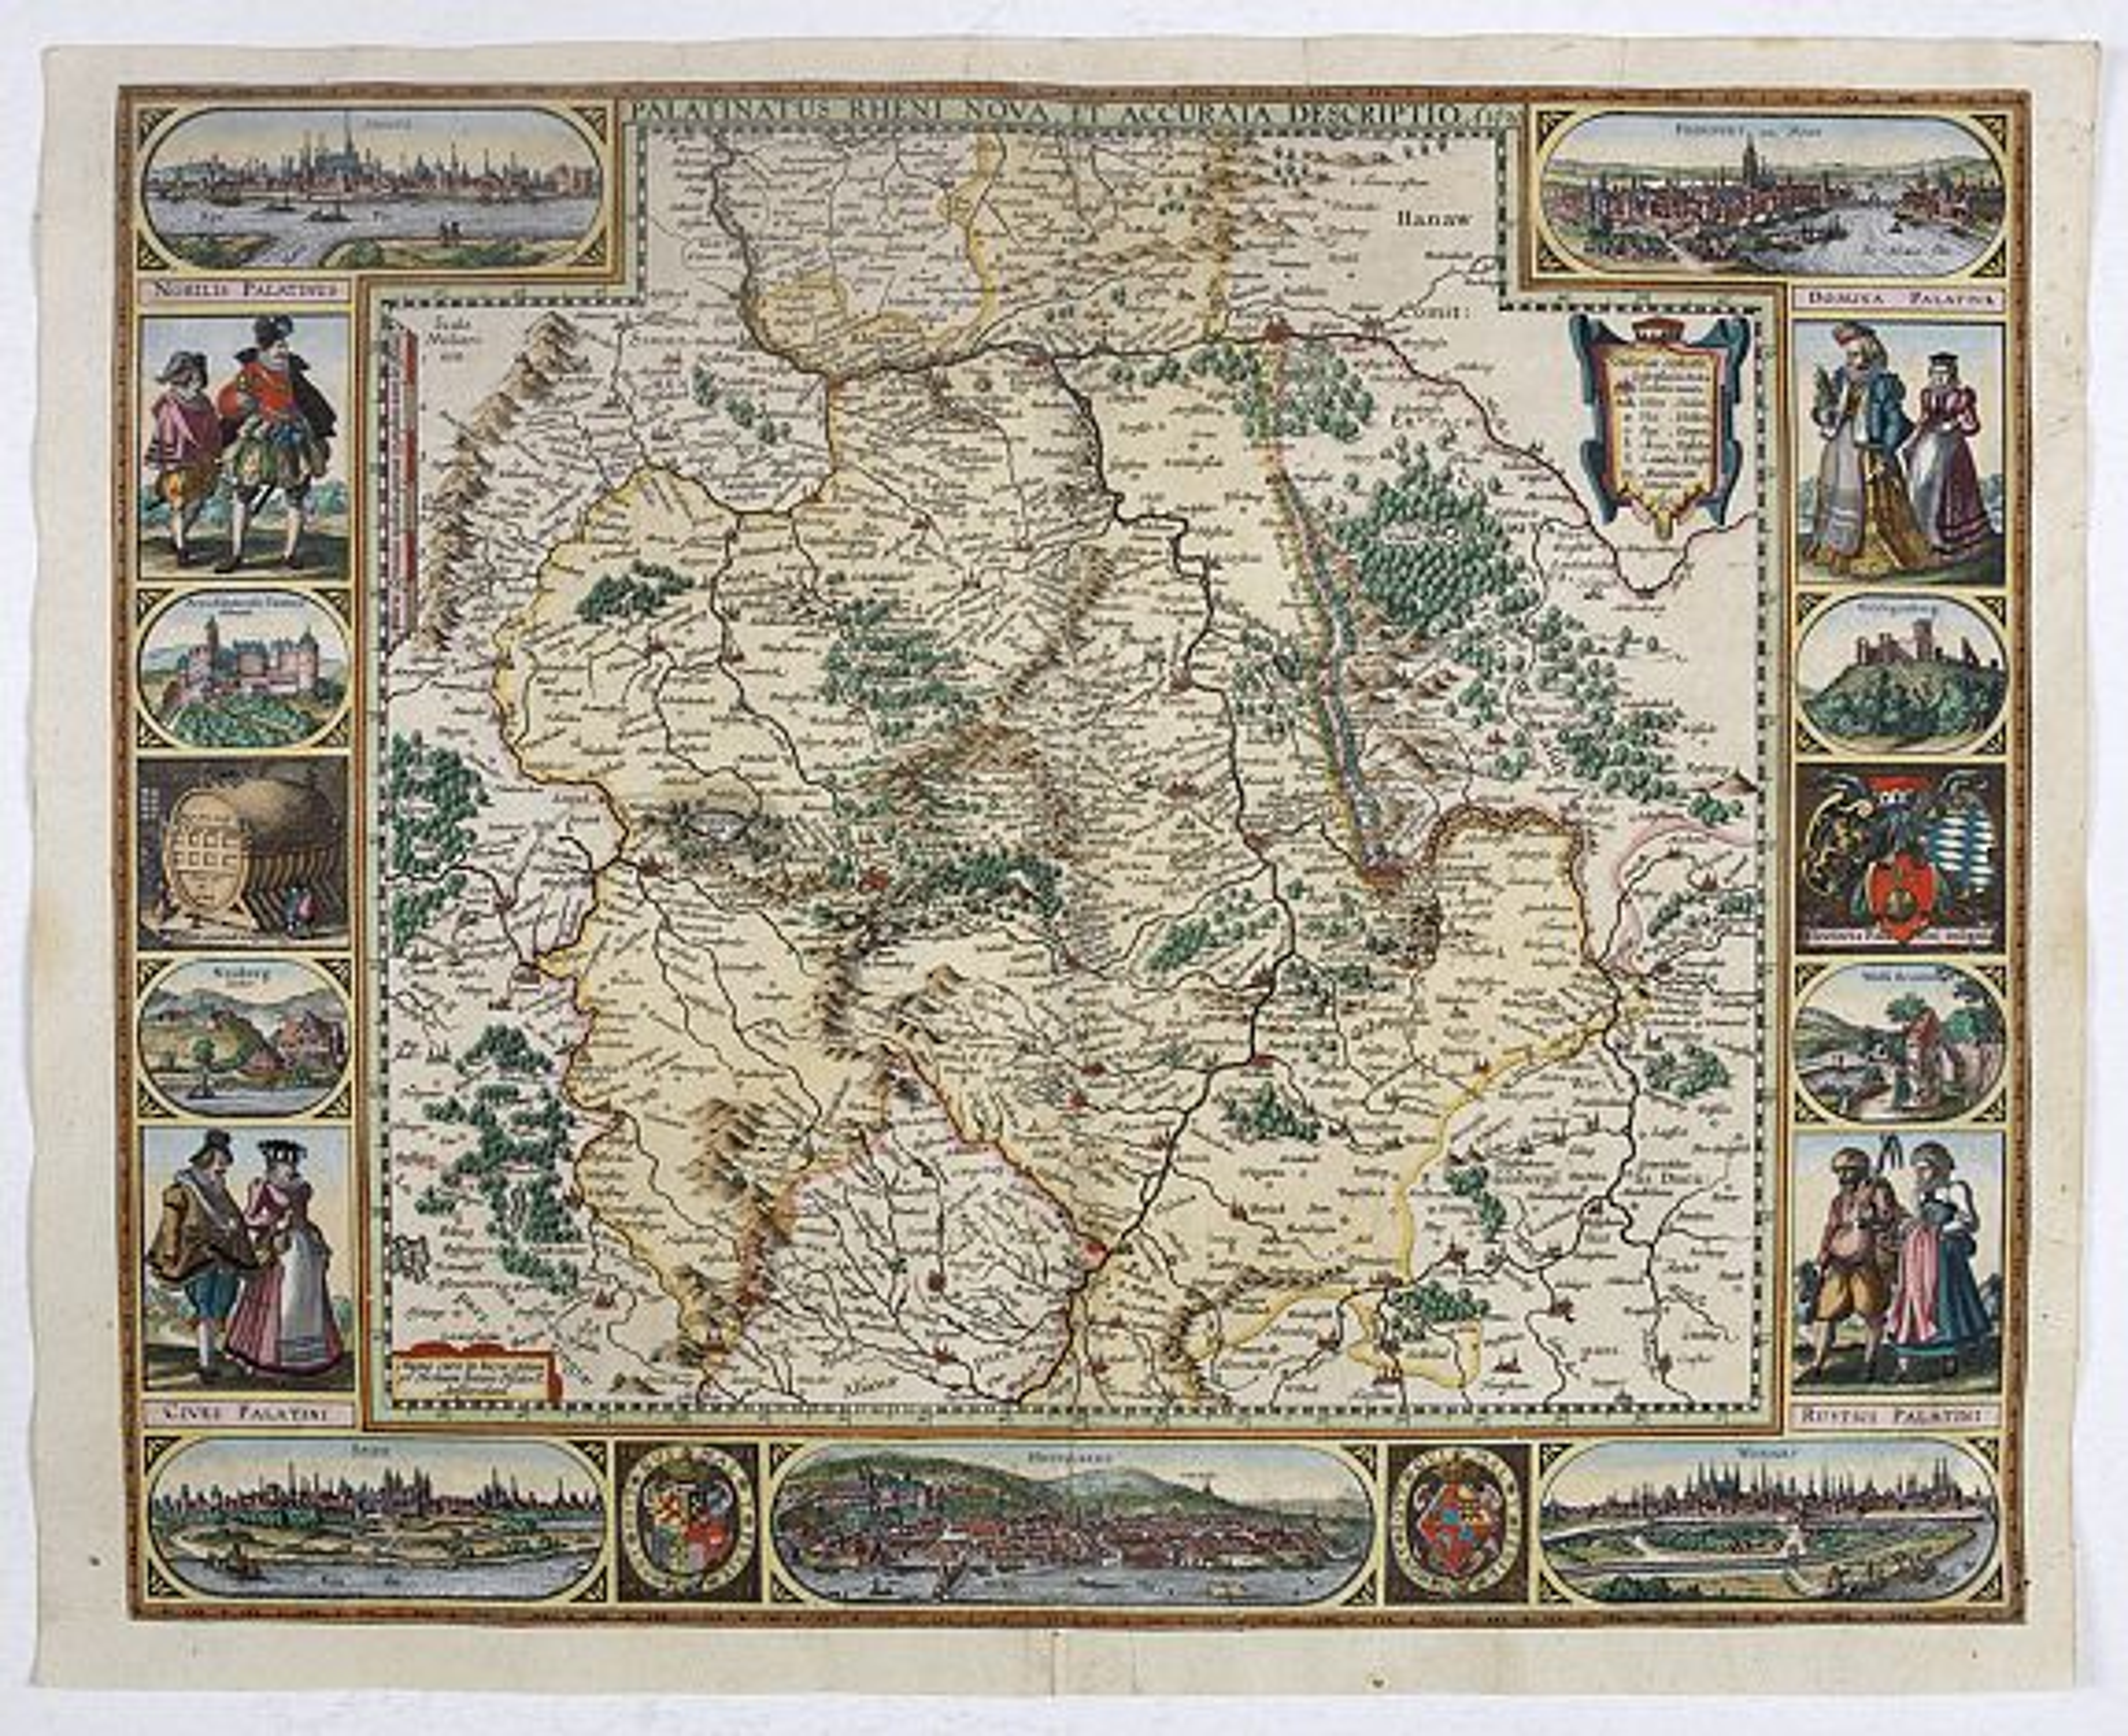 PISCATOR, N.J. -  Palatinatus Rheni Nova et Accurata Descriptio.